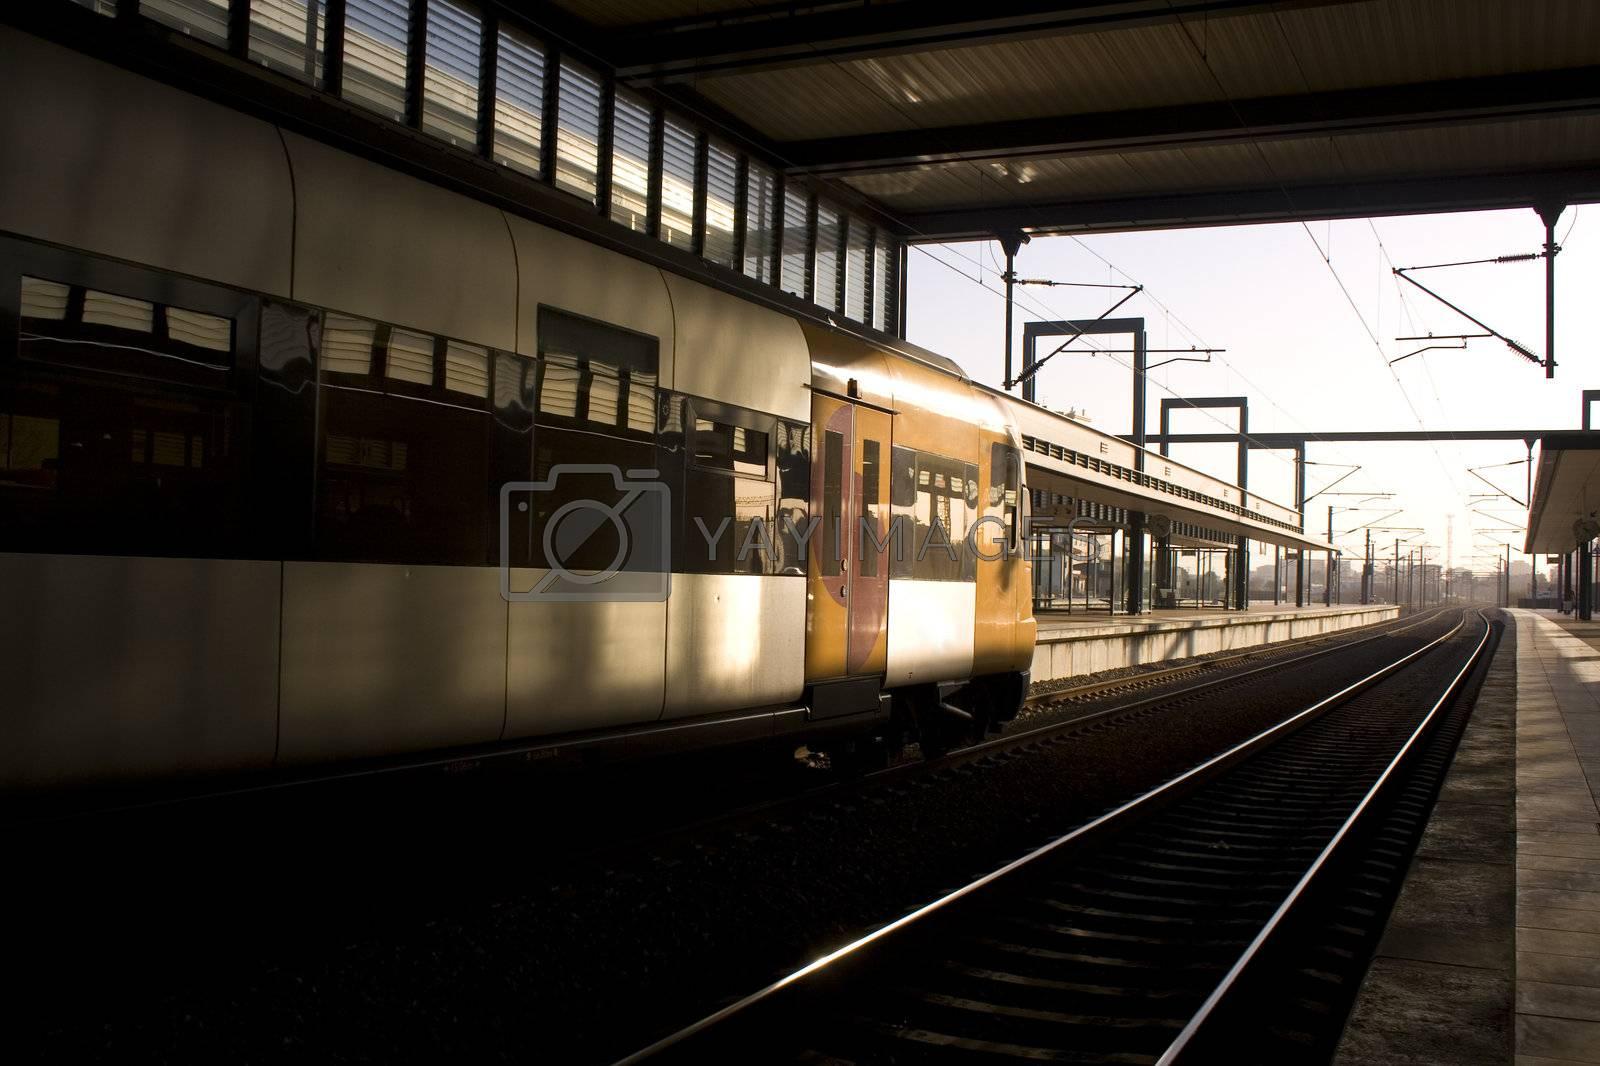 Departing Train by PauloResende